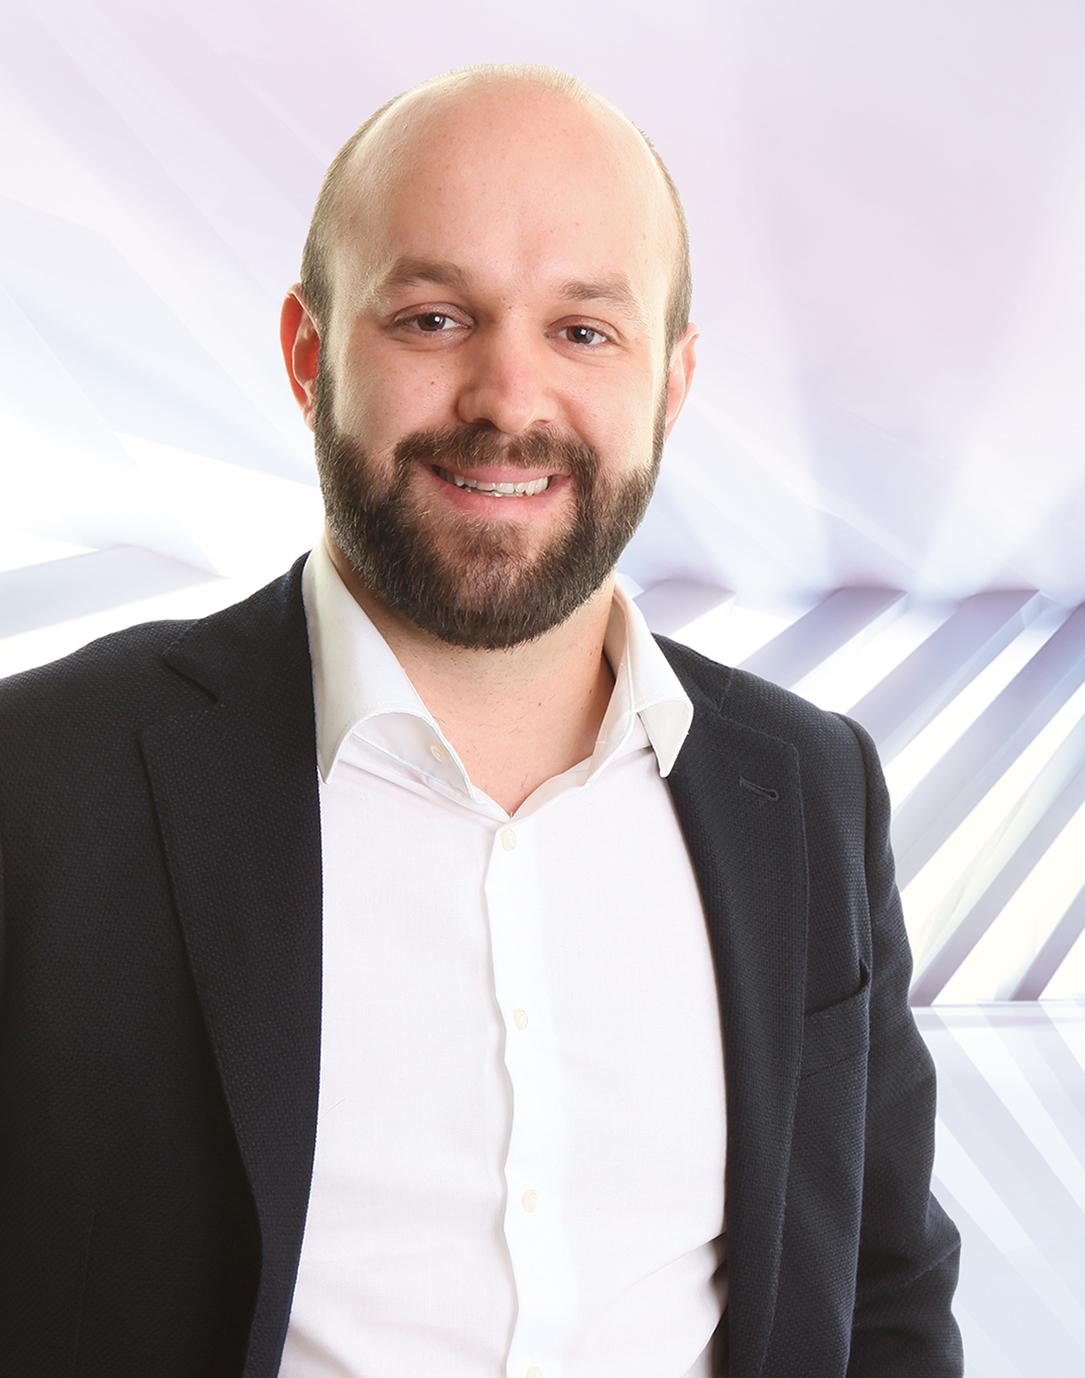 M. Loris Schnarrenberger